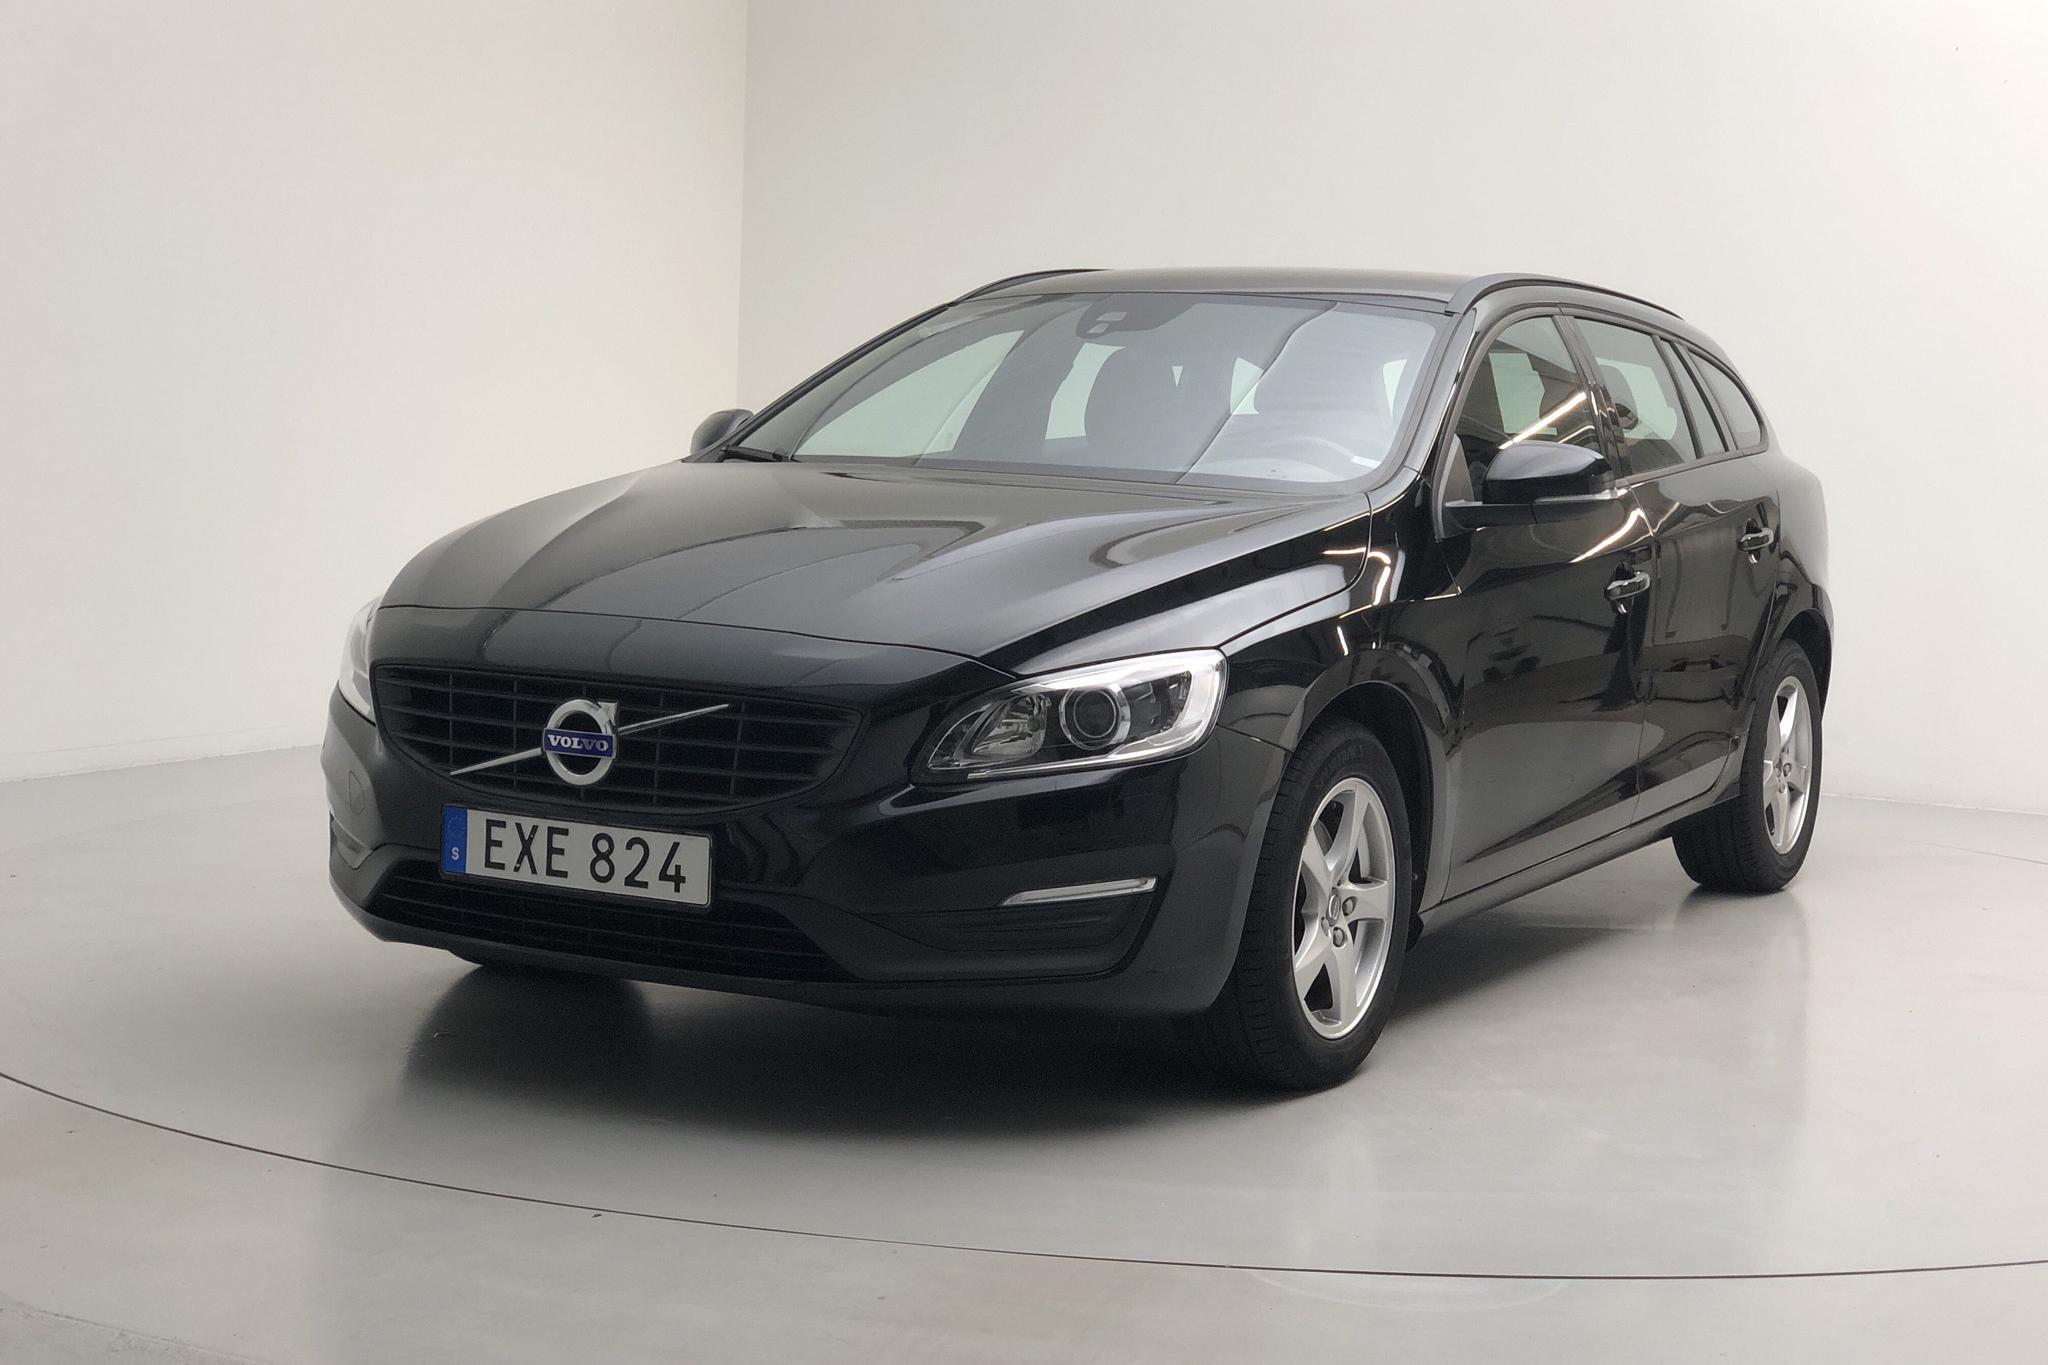 Volvo V60 T3 (152hk) - 74 090 km - Automatic - black - 2018